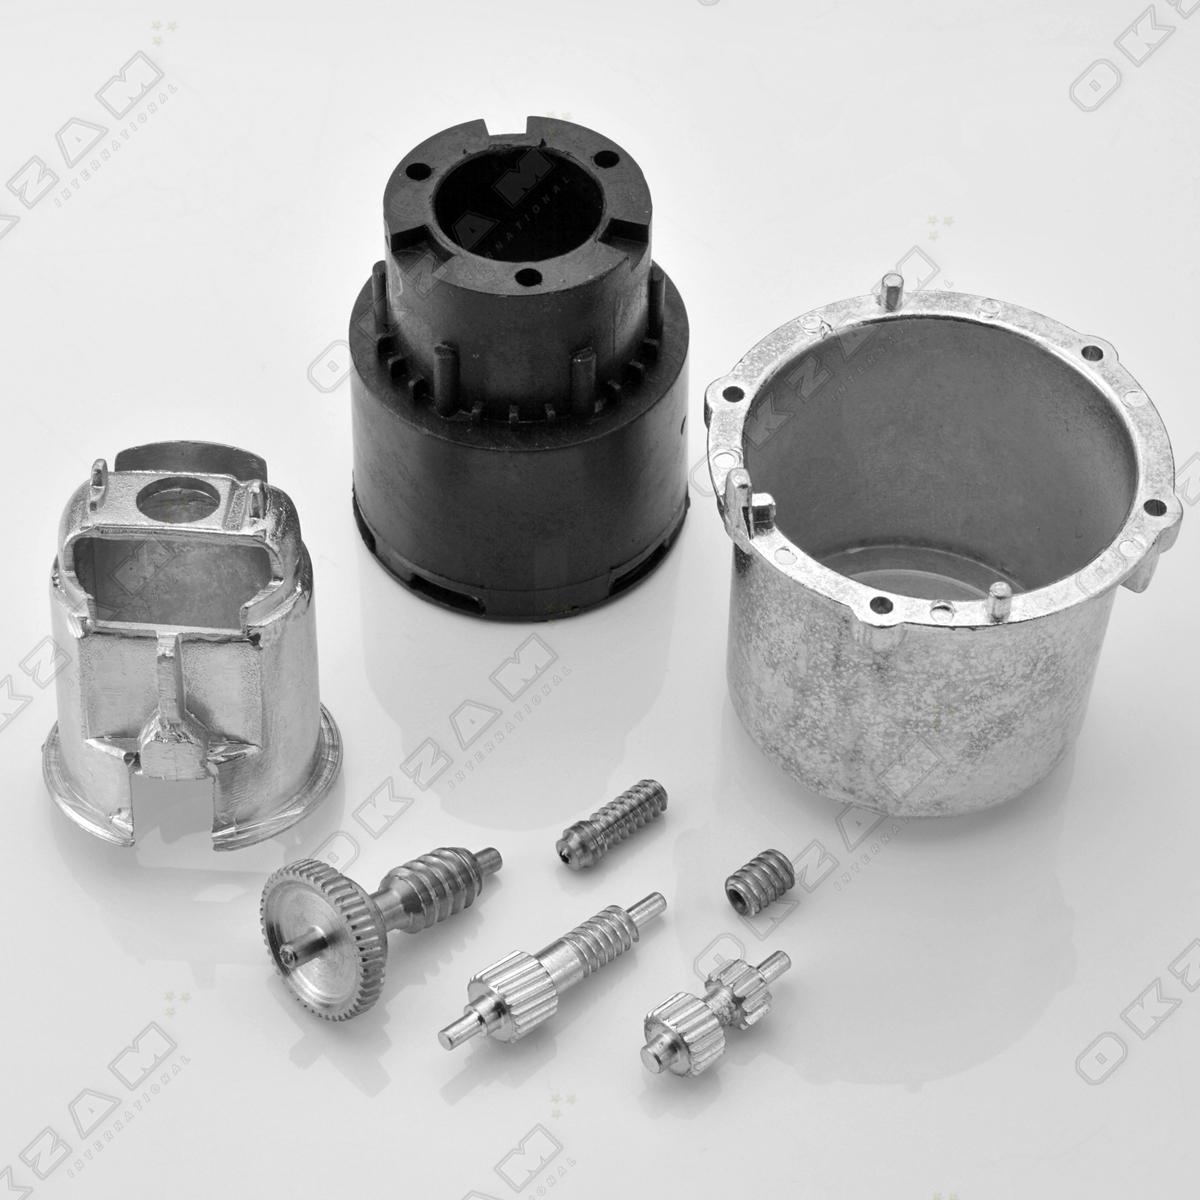 Exterior mirror repair kit for folding 8 teilig l r for for Mirror repair kit